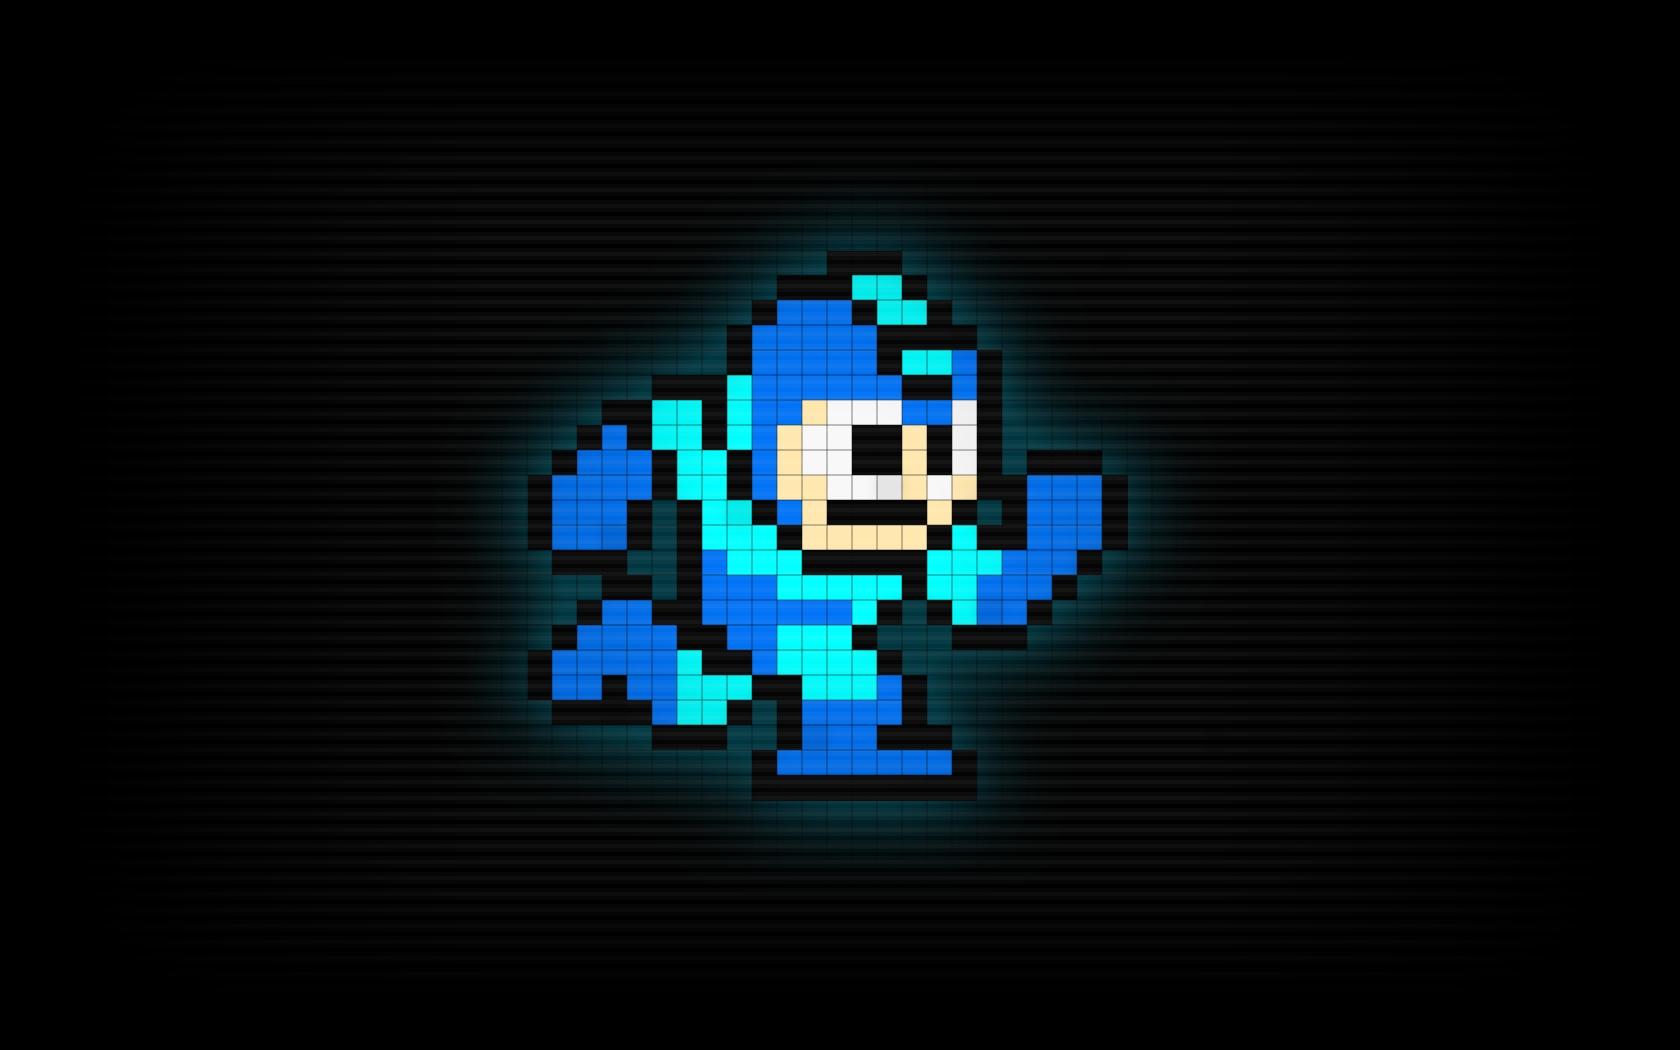 Megaman juego - 1680x1050